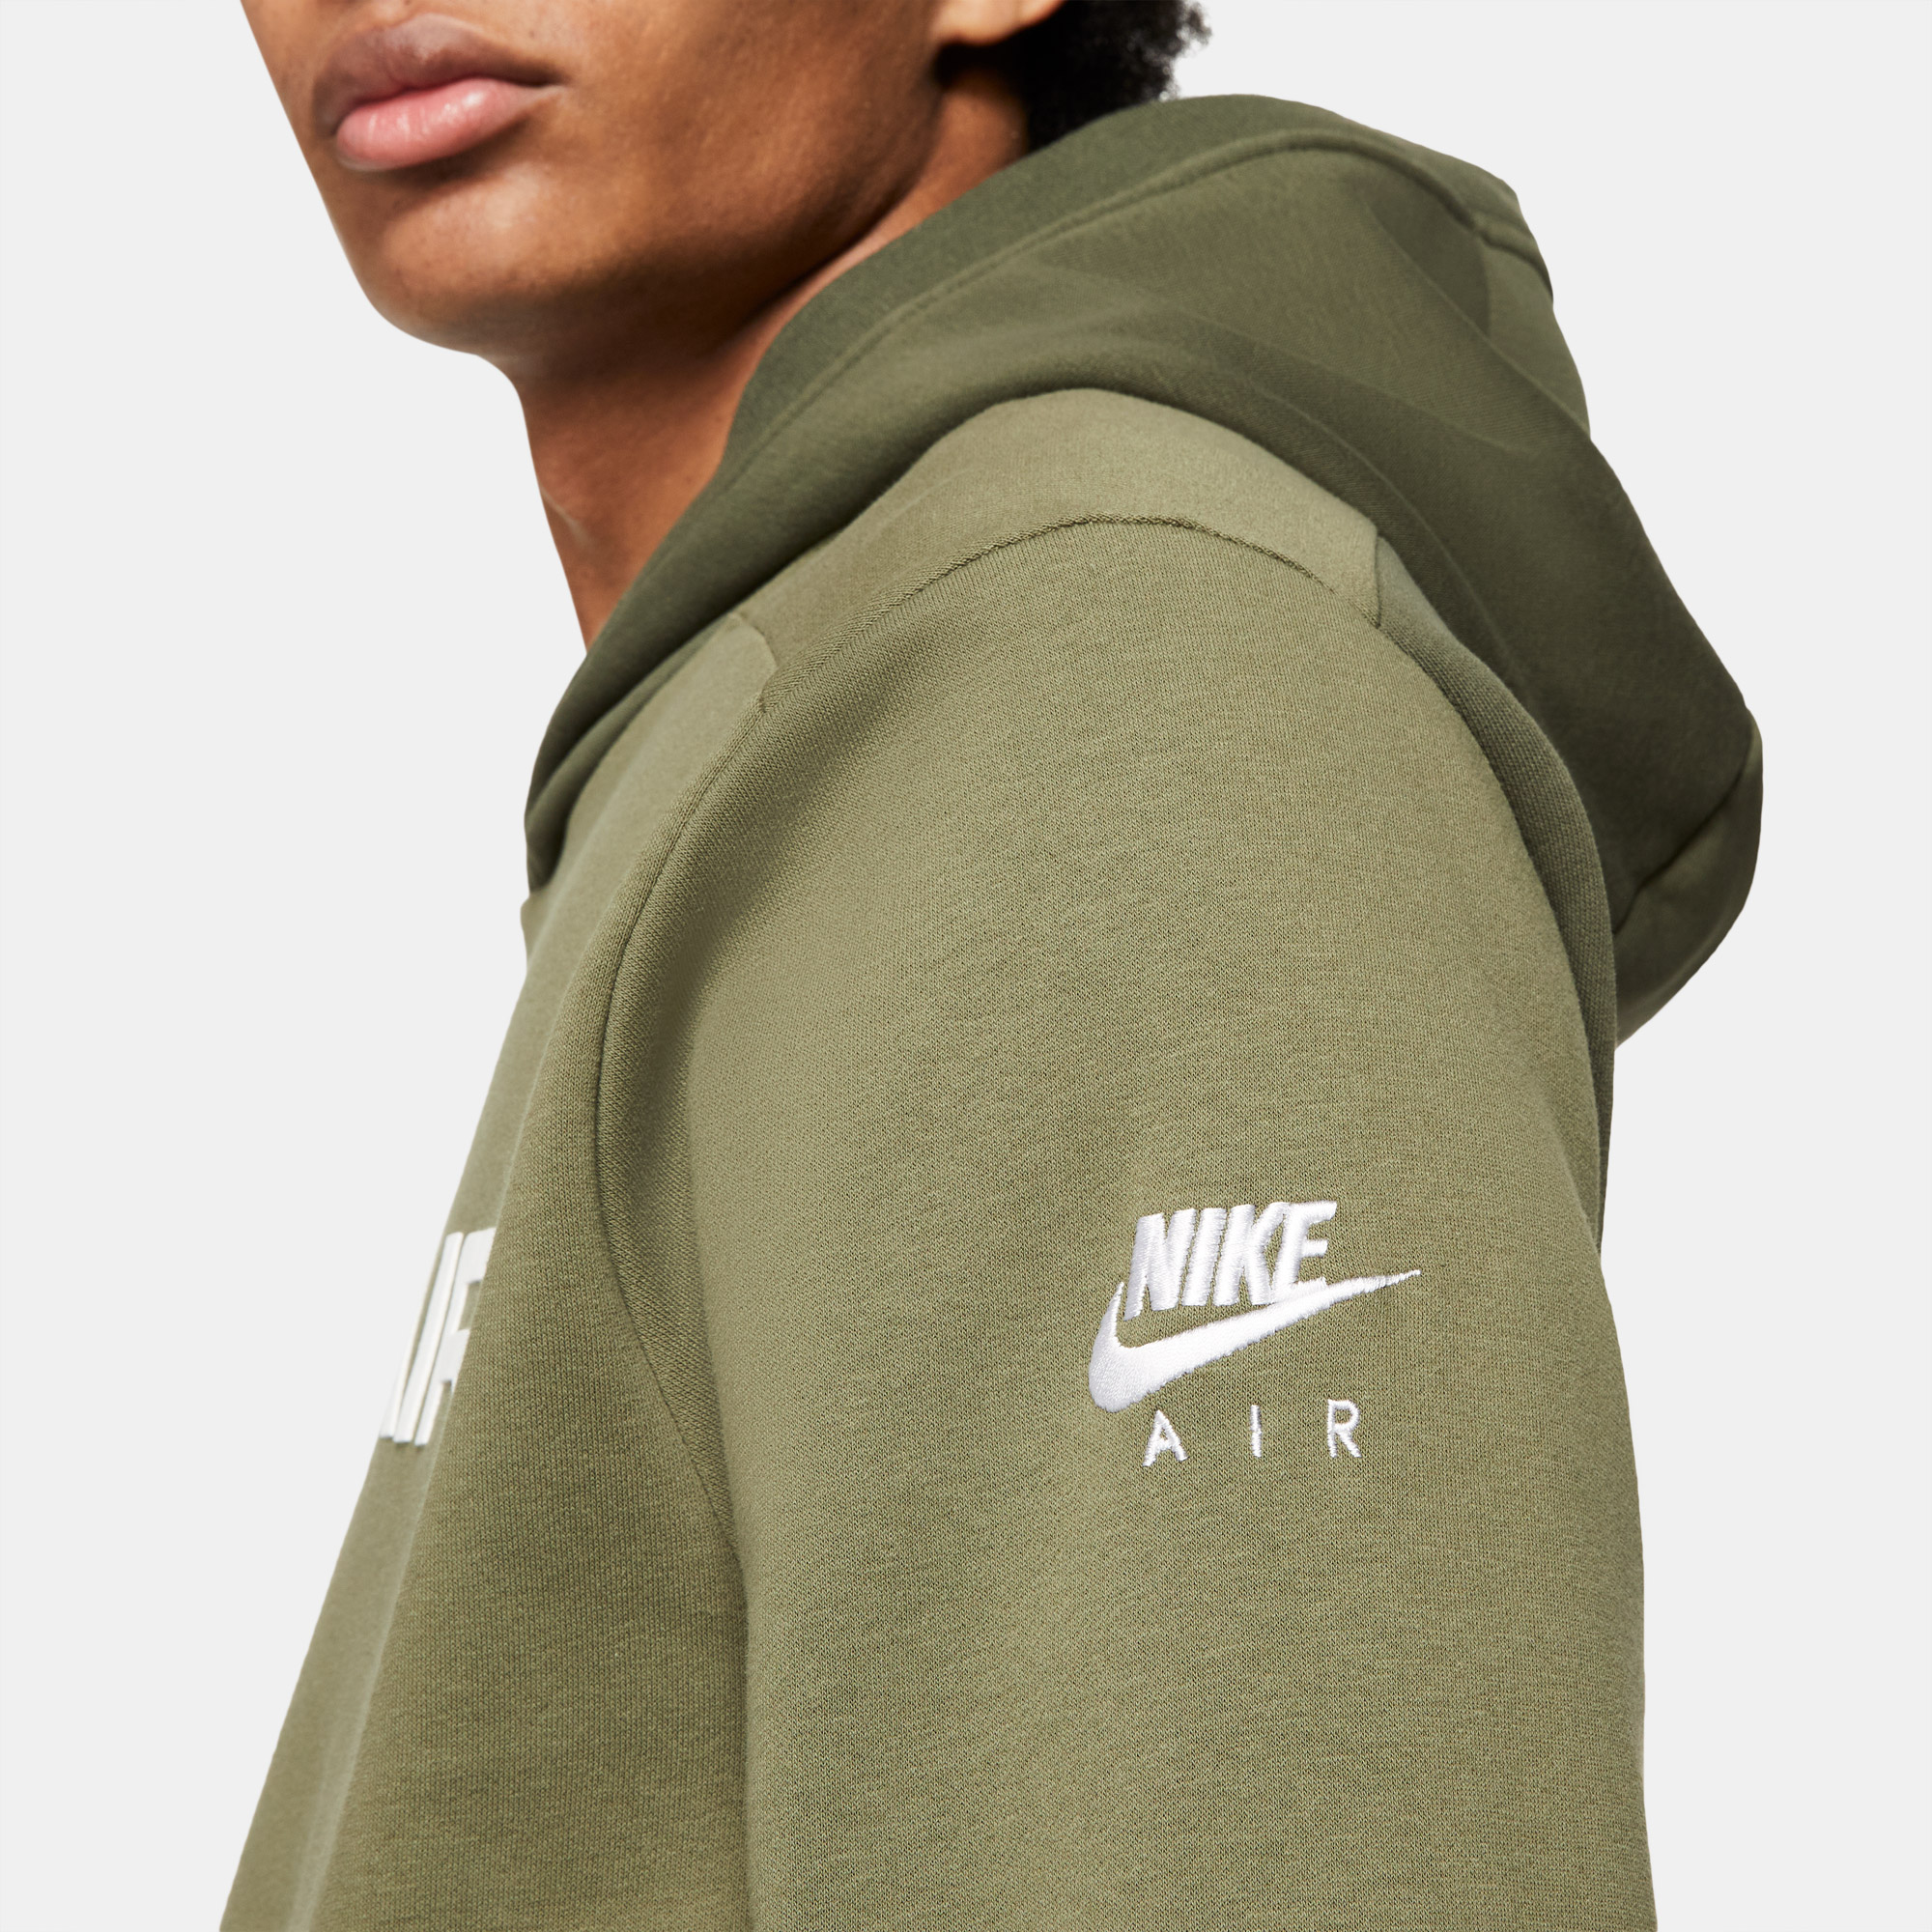 Nike Sportswear Air Pullover Flc Erkek Haki Sweatshirt